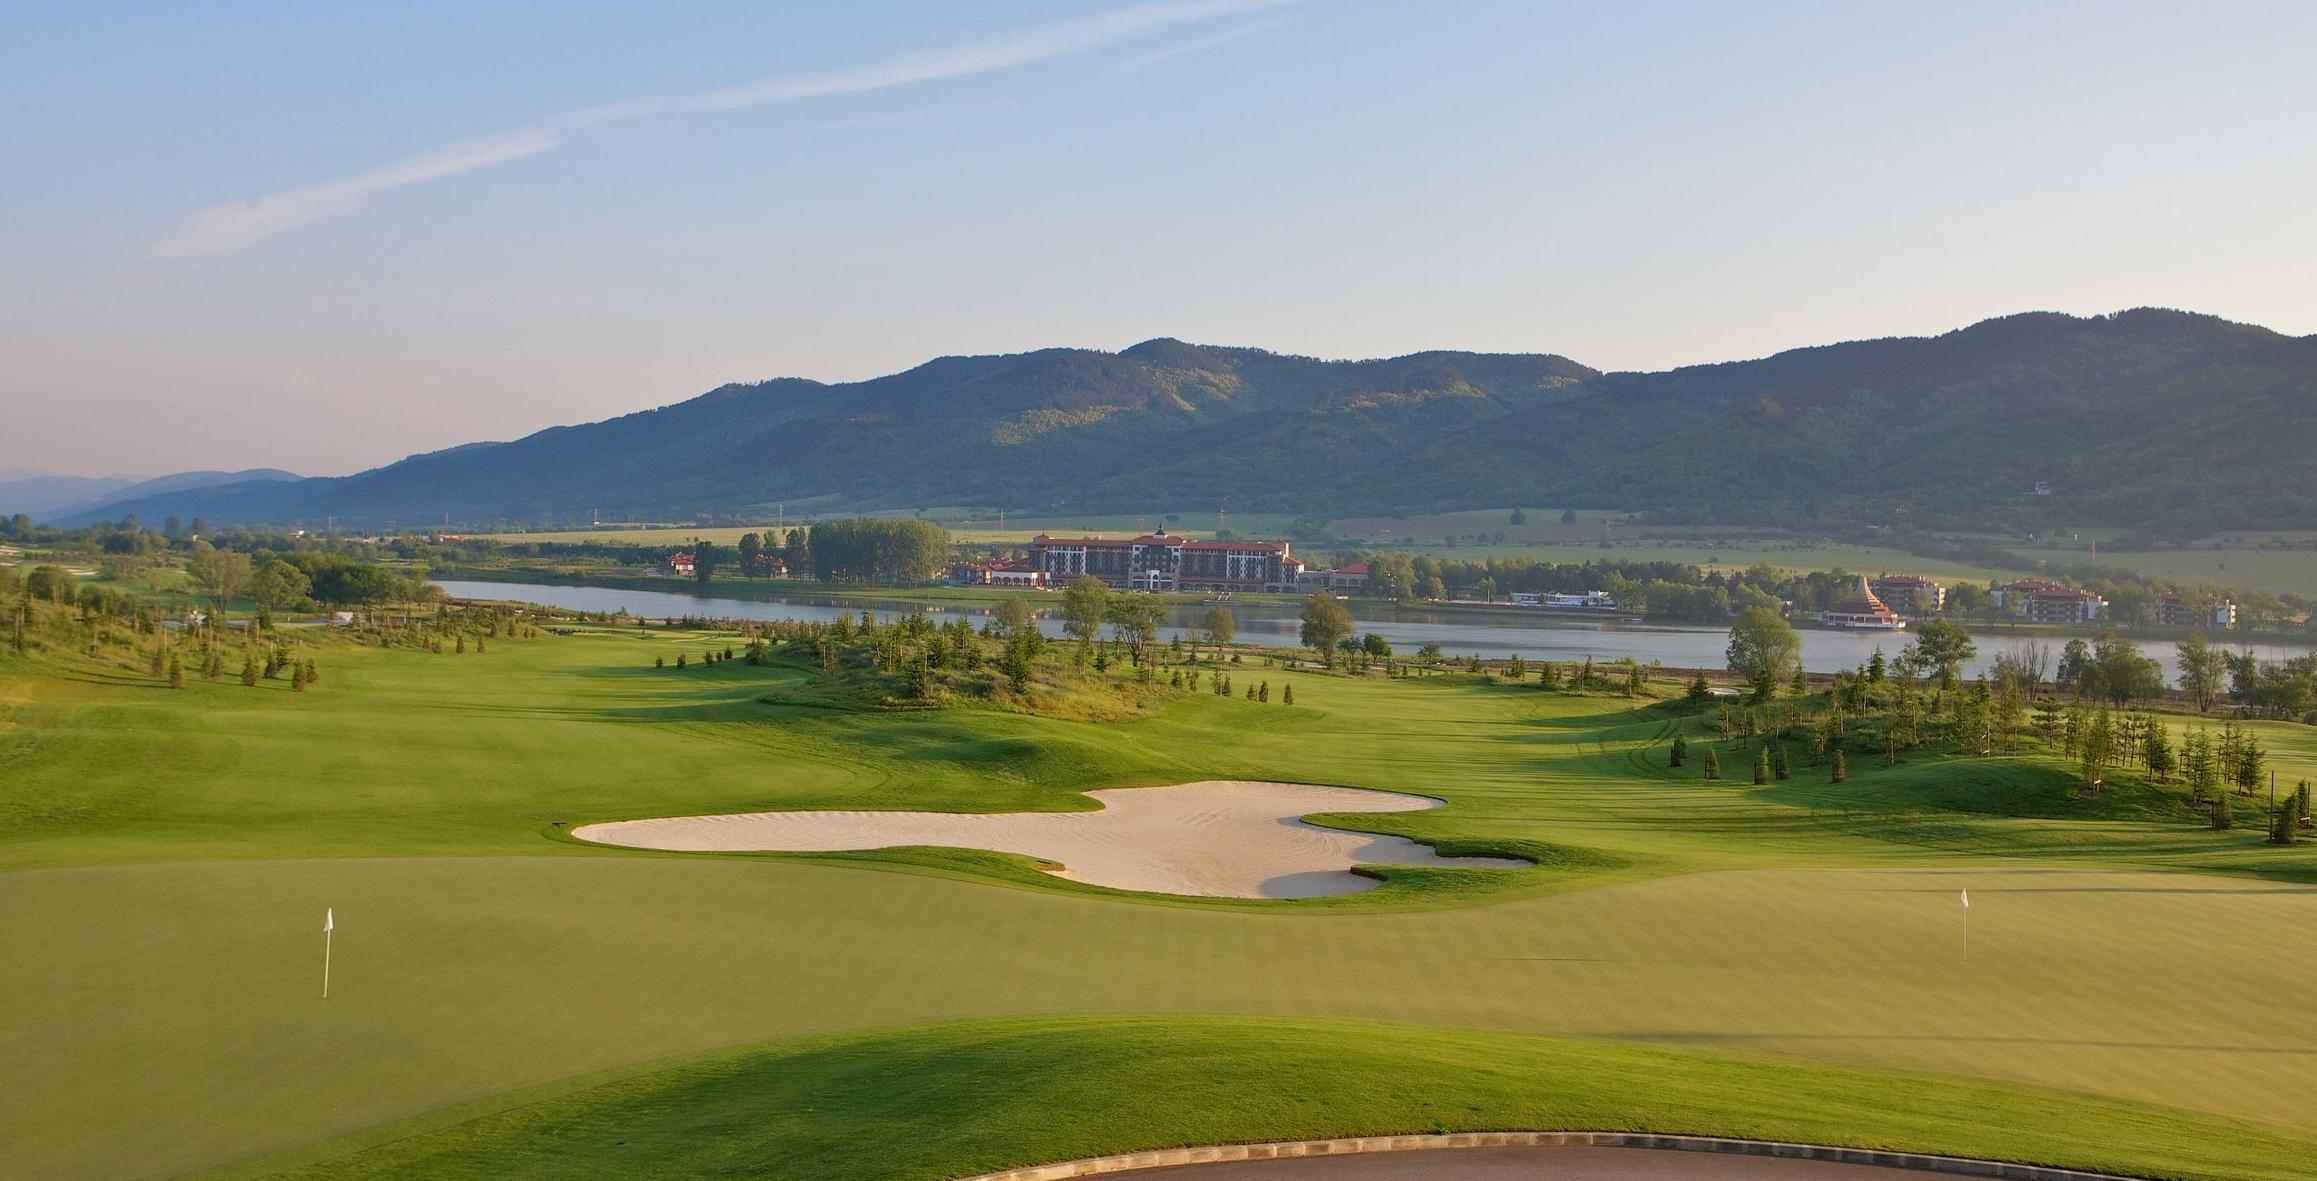 9th & 18th green at Pravets Golf & Spa, Bulgaria